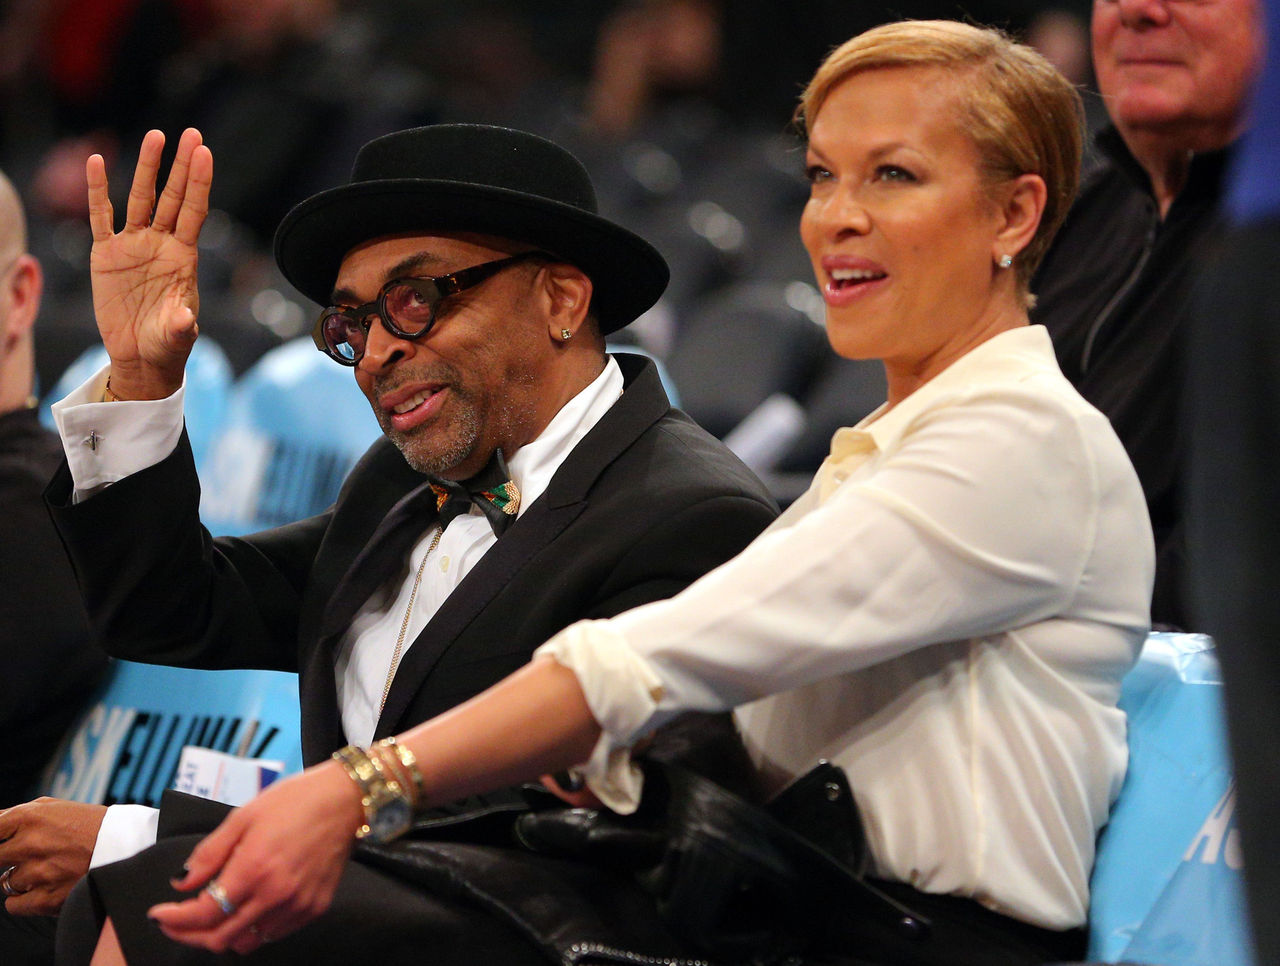 Knicks fan Spike Lee prefers Melo, offers to pack Phil Jackson's bags